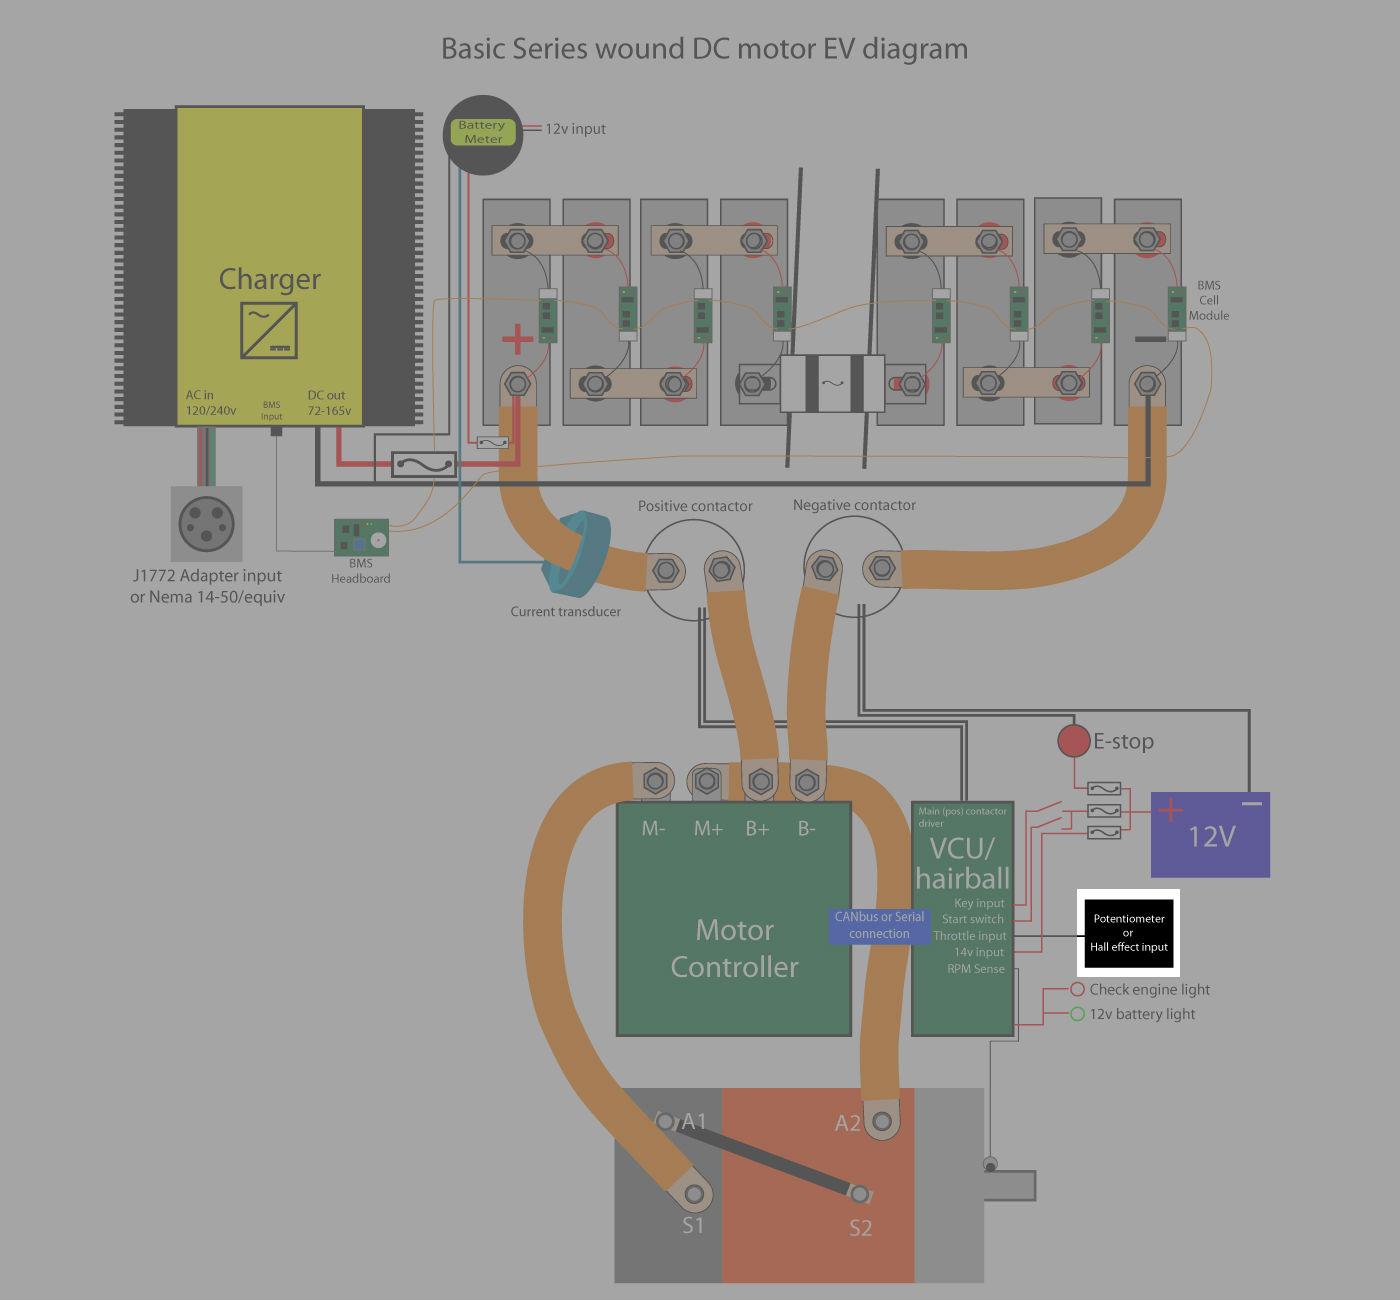 Diy Ev Conversion Part 3 Its Lightning Yall Ac Proximity Switch Wiring Daves Diagram Sensors